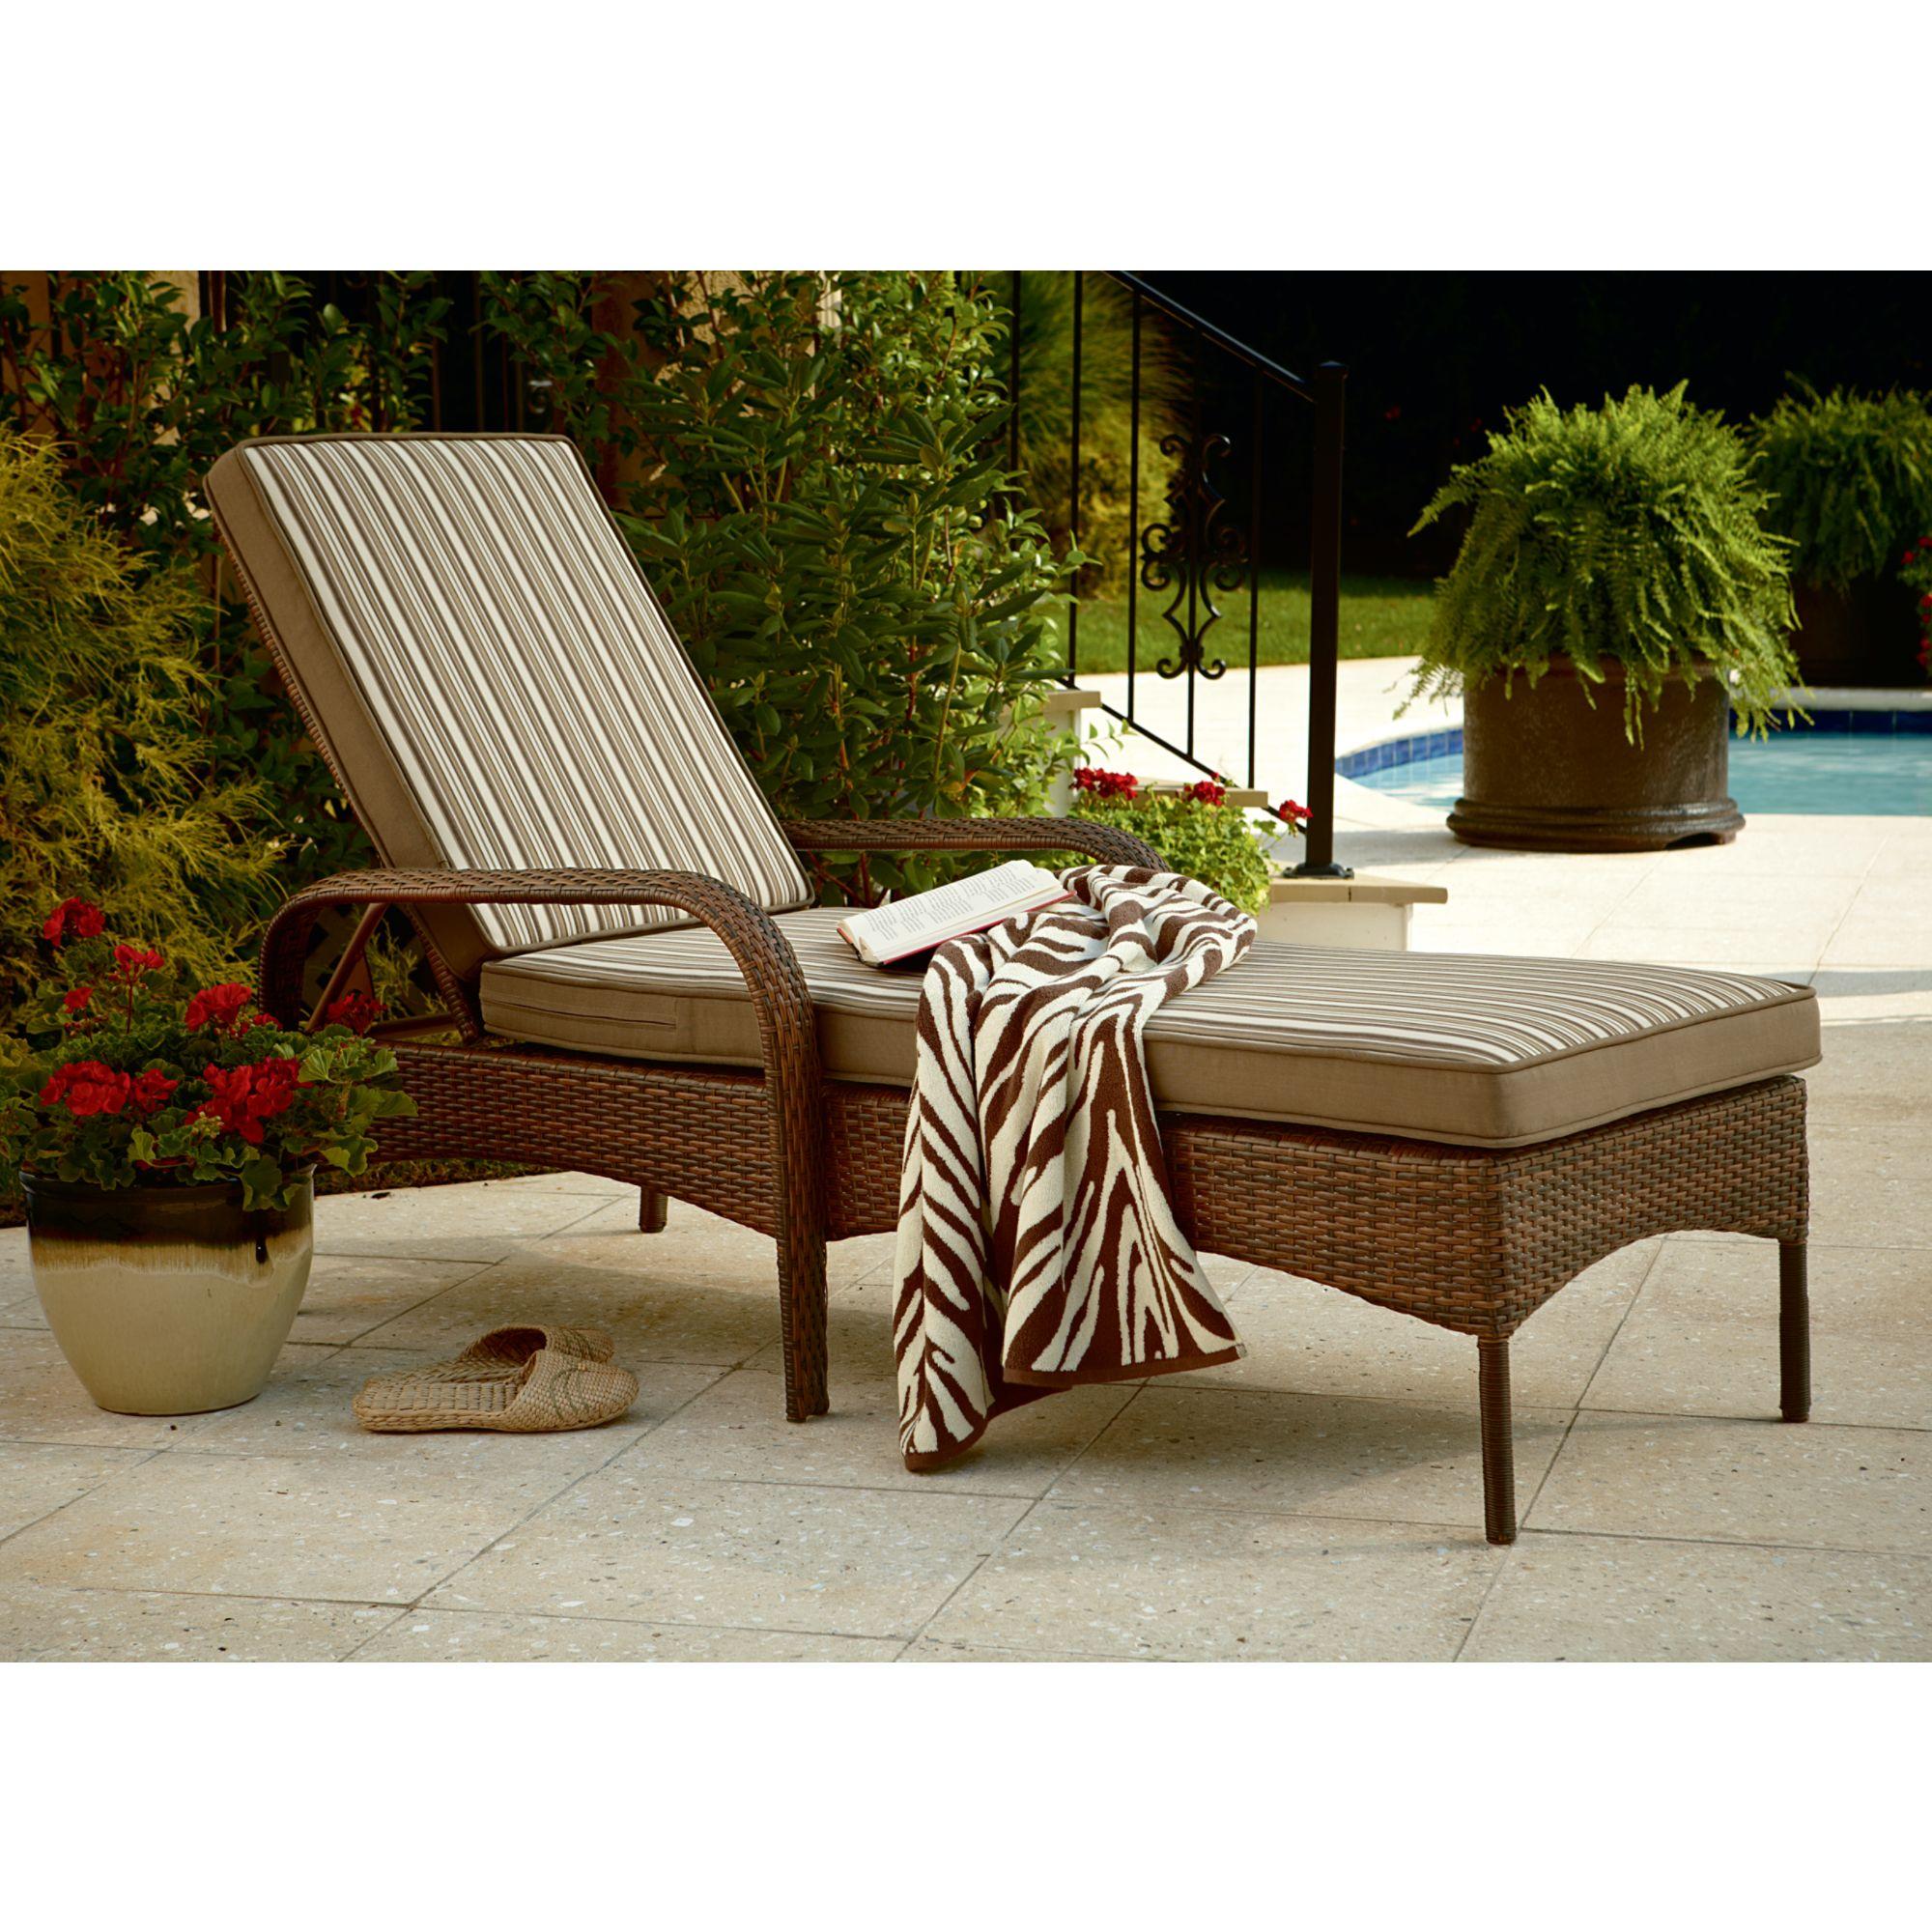 High Quality Sears Wicker Patio Furniture | Sears Patio Furniture Replacement Cushions | Sears  Patio Furniture